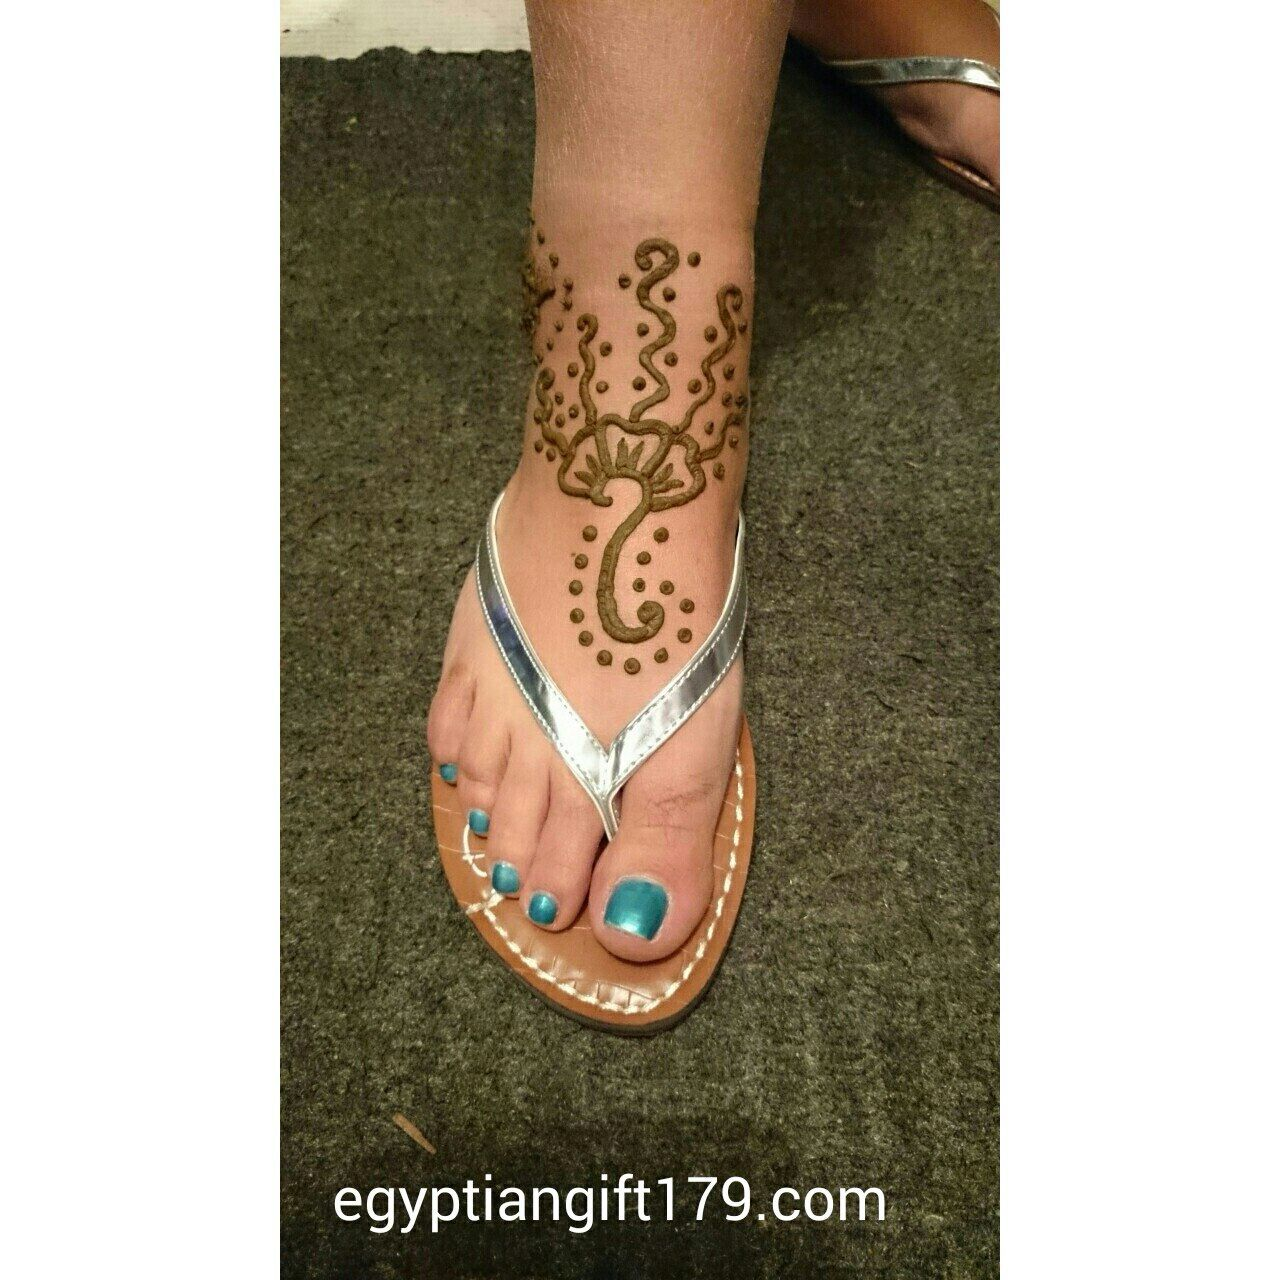 Egyptian gift corner tattoo near me henna shop henna kit